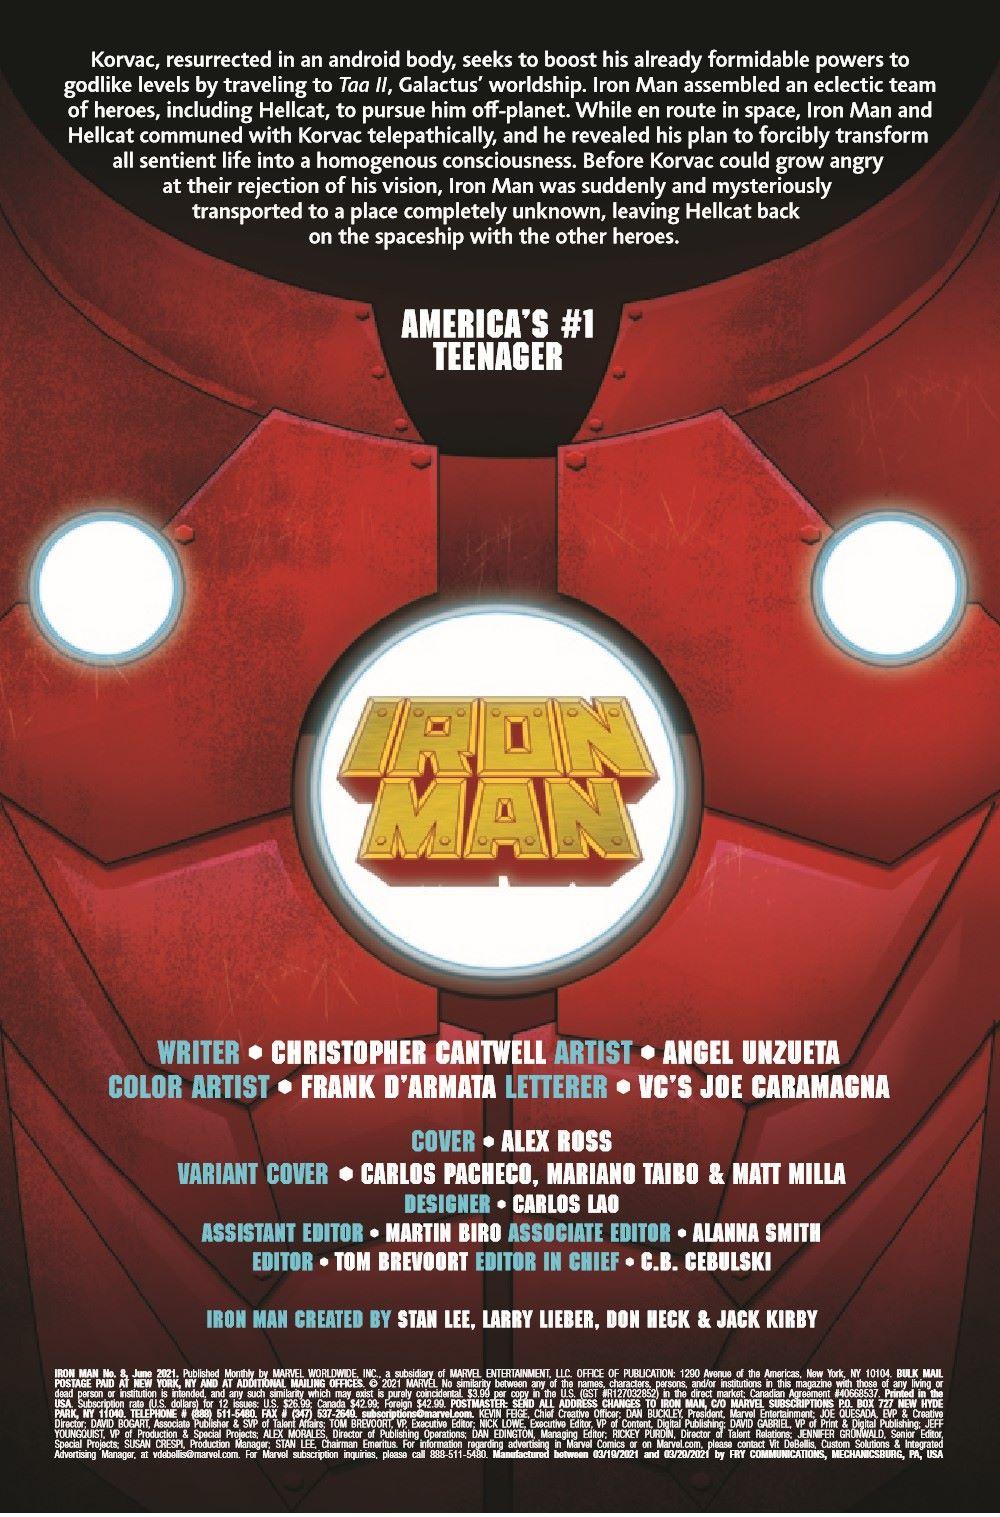 IM2020008_Preview-2 ComicList Previews: IRON MAN #8